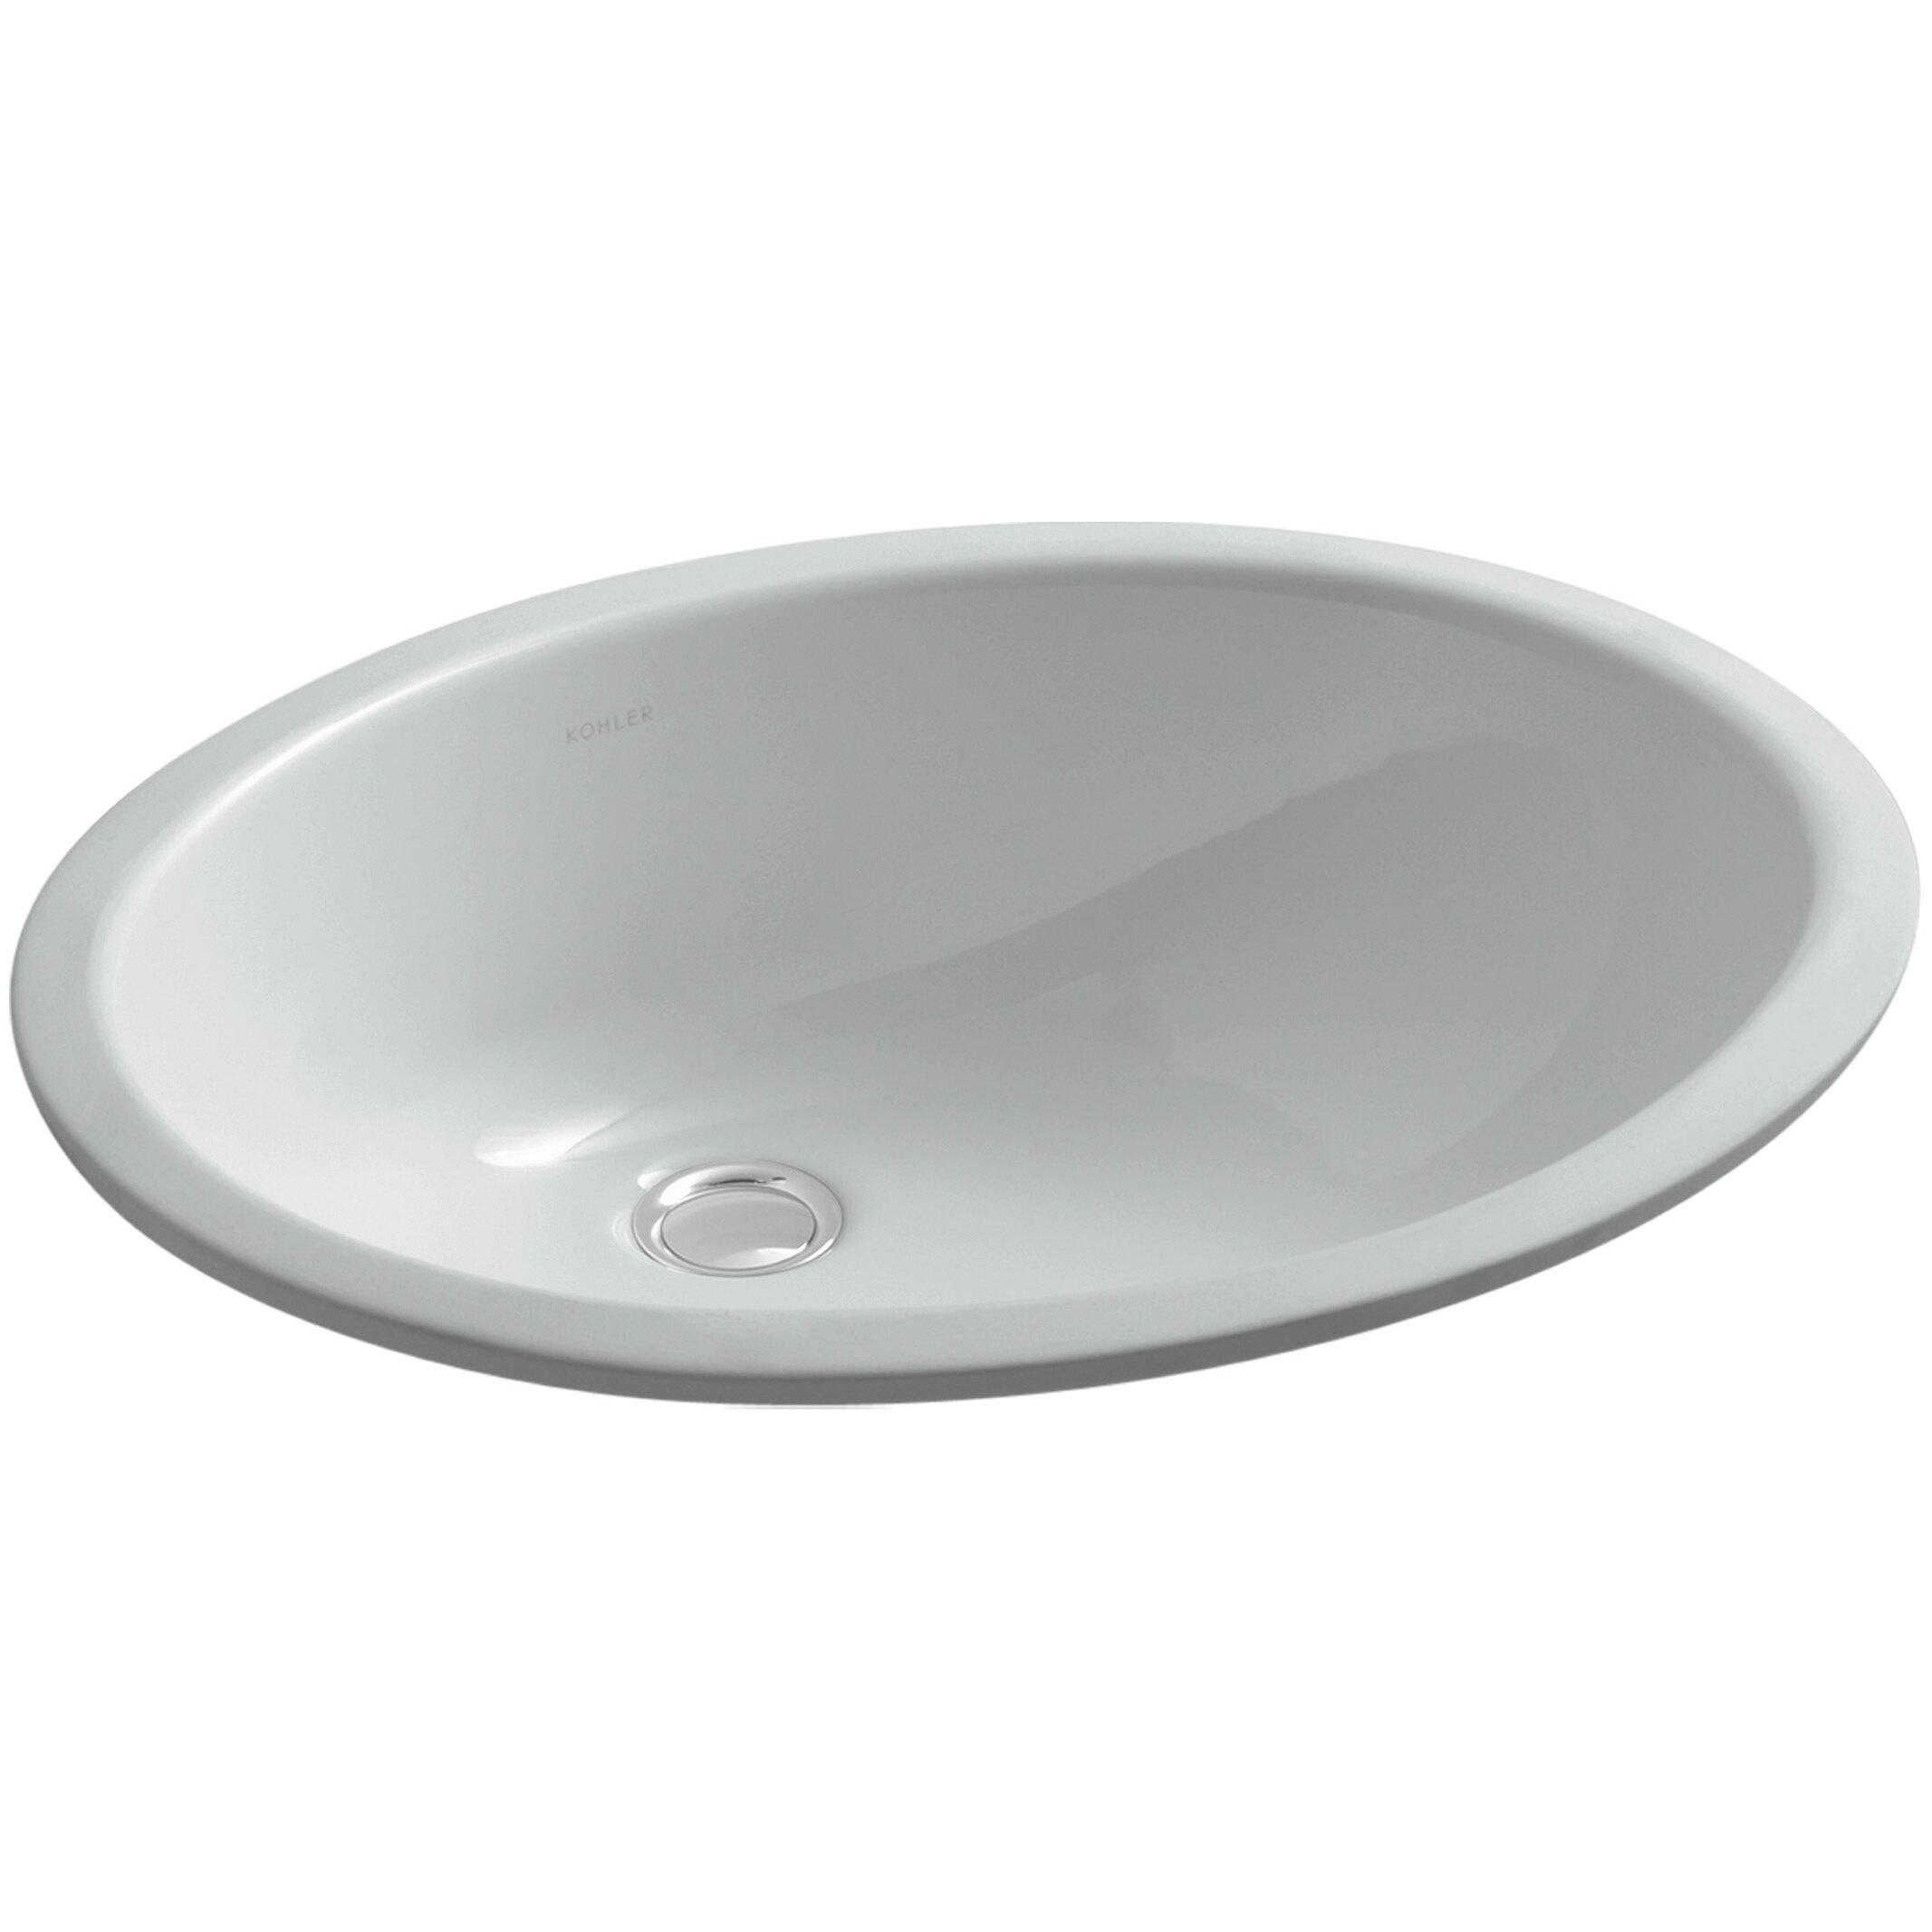 Kohler Caxton Undermount Bathroom Sink with Overflow and ...